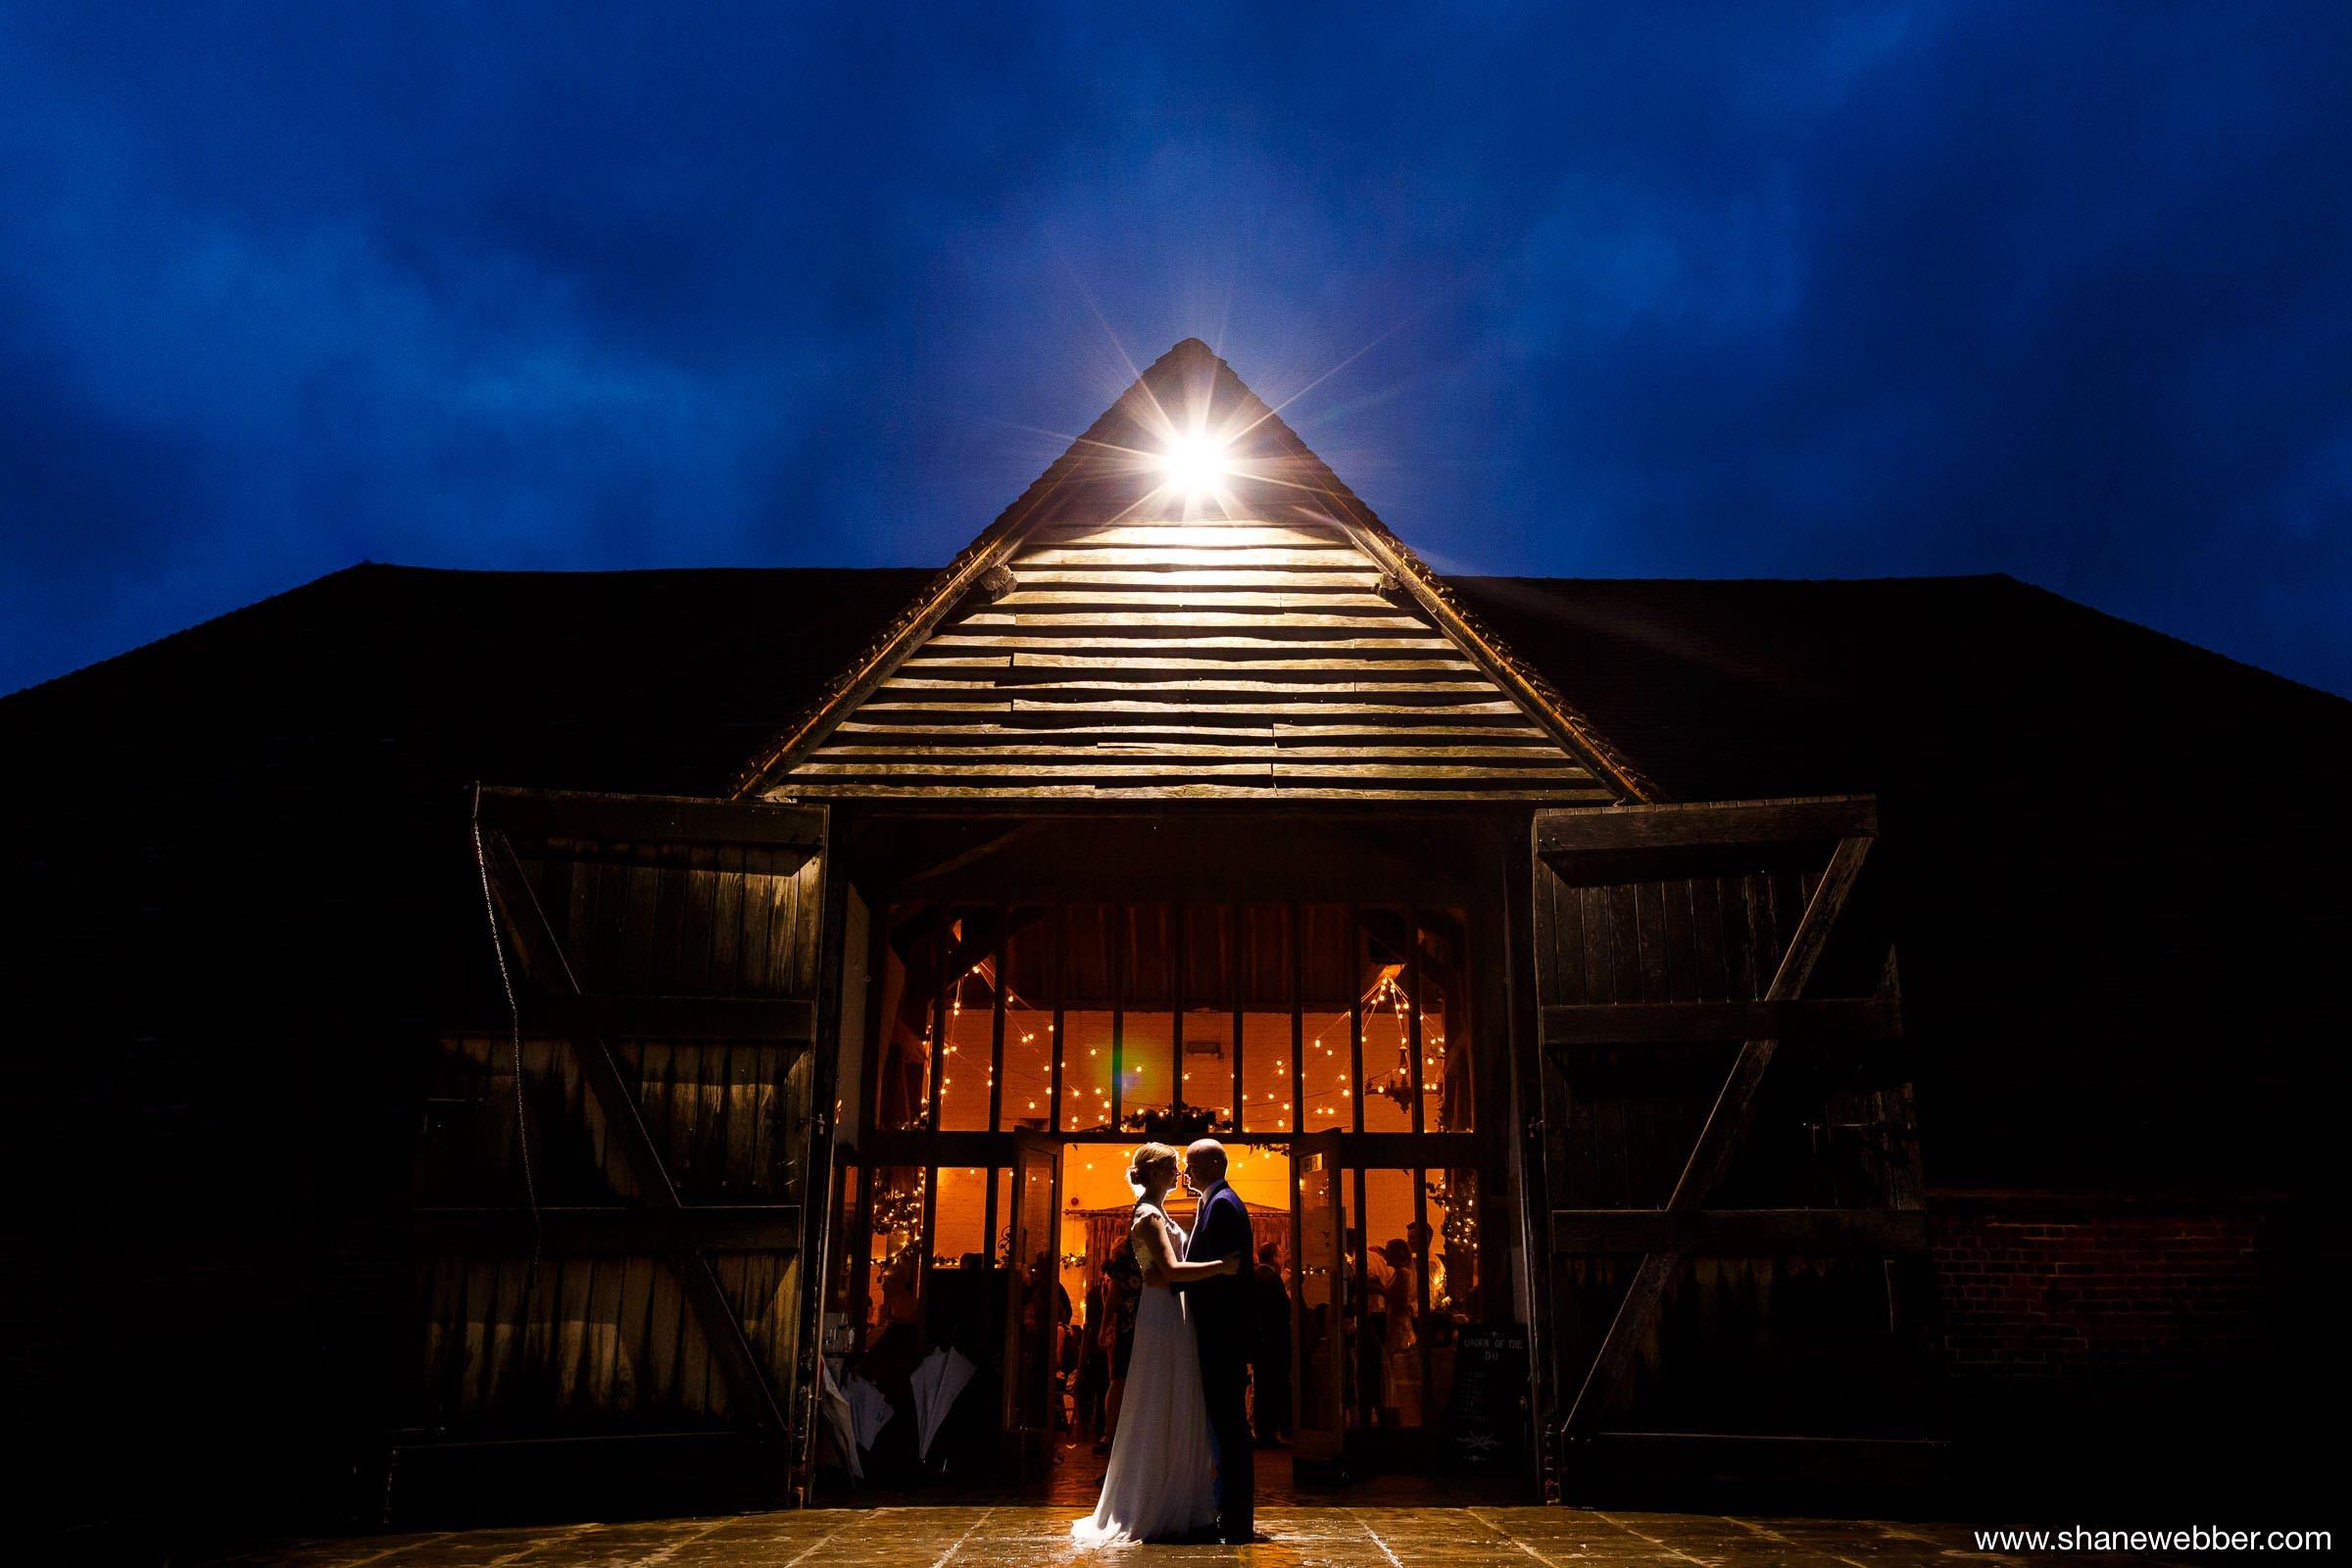 Contemporary Manchester wedding photographer